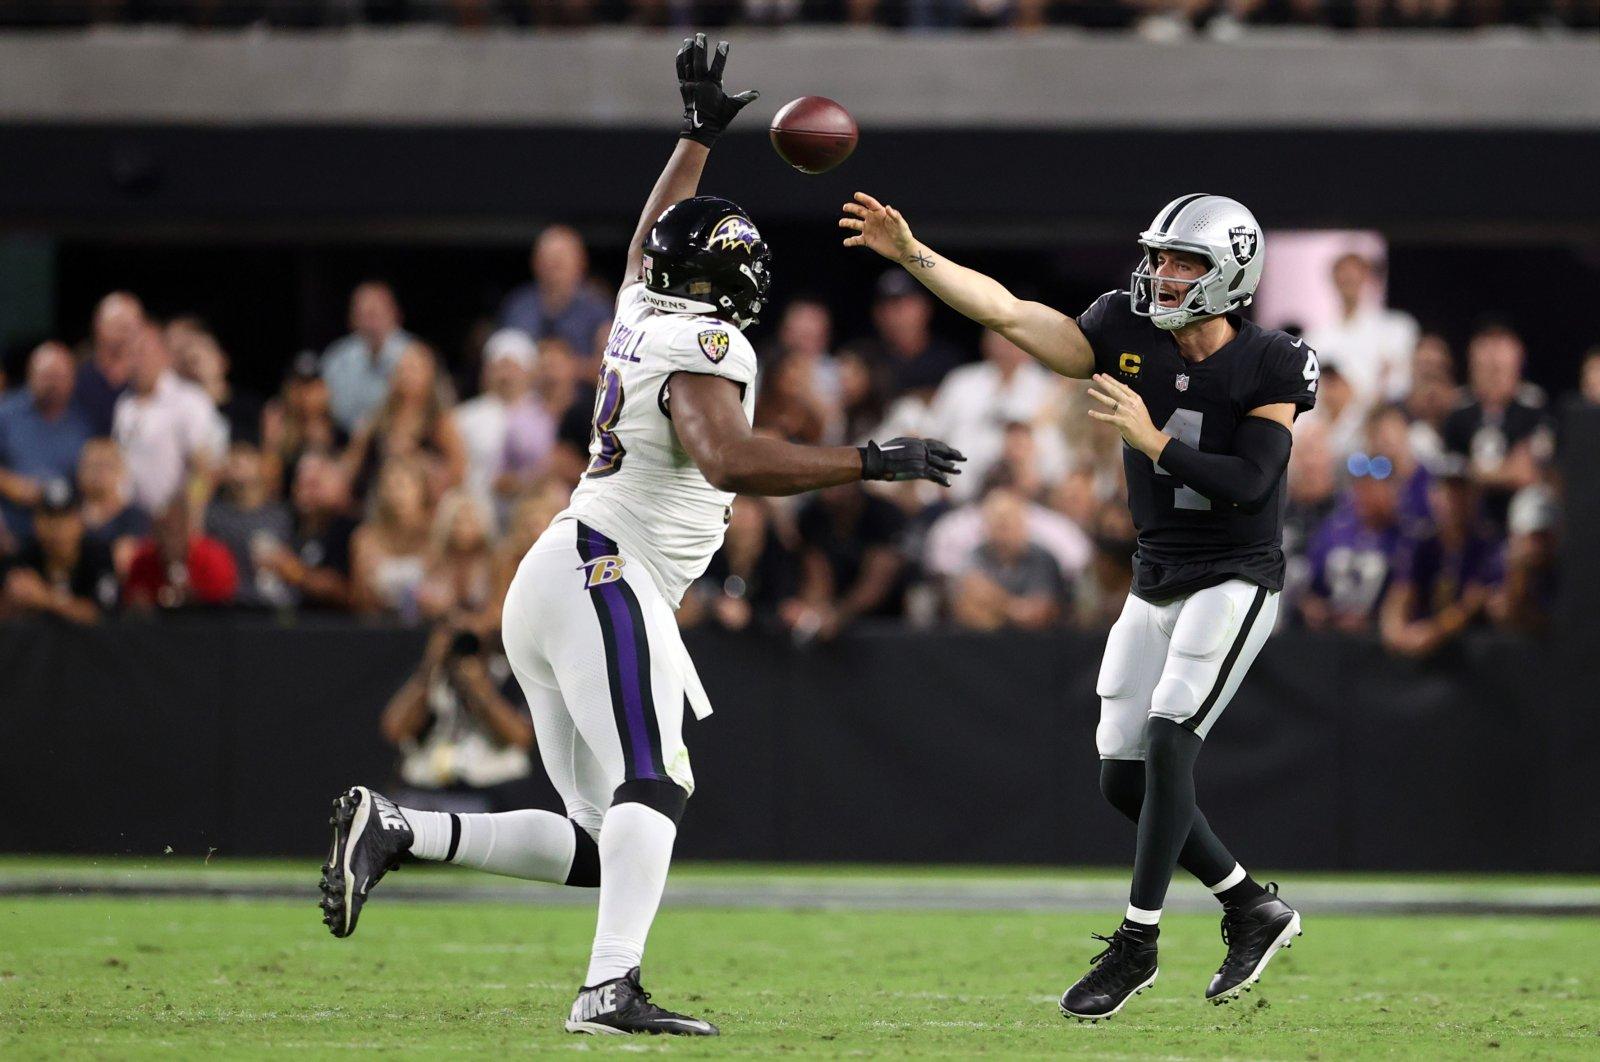 Derek Carr (4) of the Las Vegas Raiders makes a pass against the Baltimore Ravens at Allegiant Stadium, Las Vegas, Nevada, U.S., Sept. 13, 2021. (Getty Images via AFP)